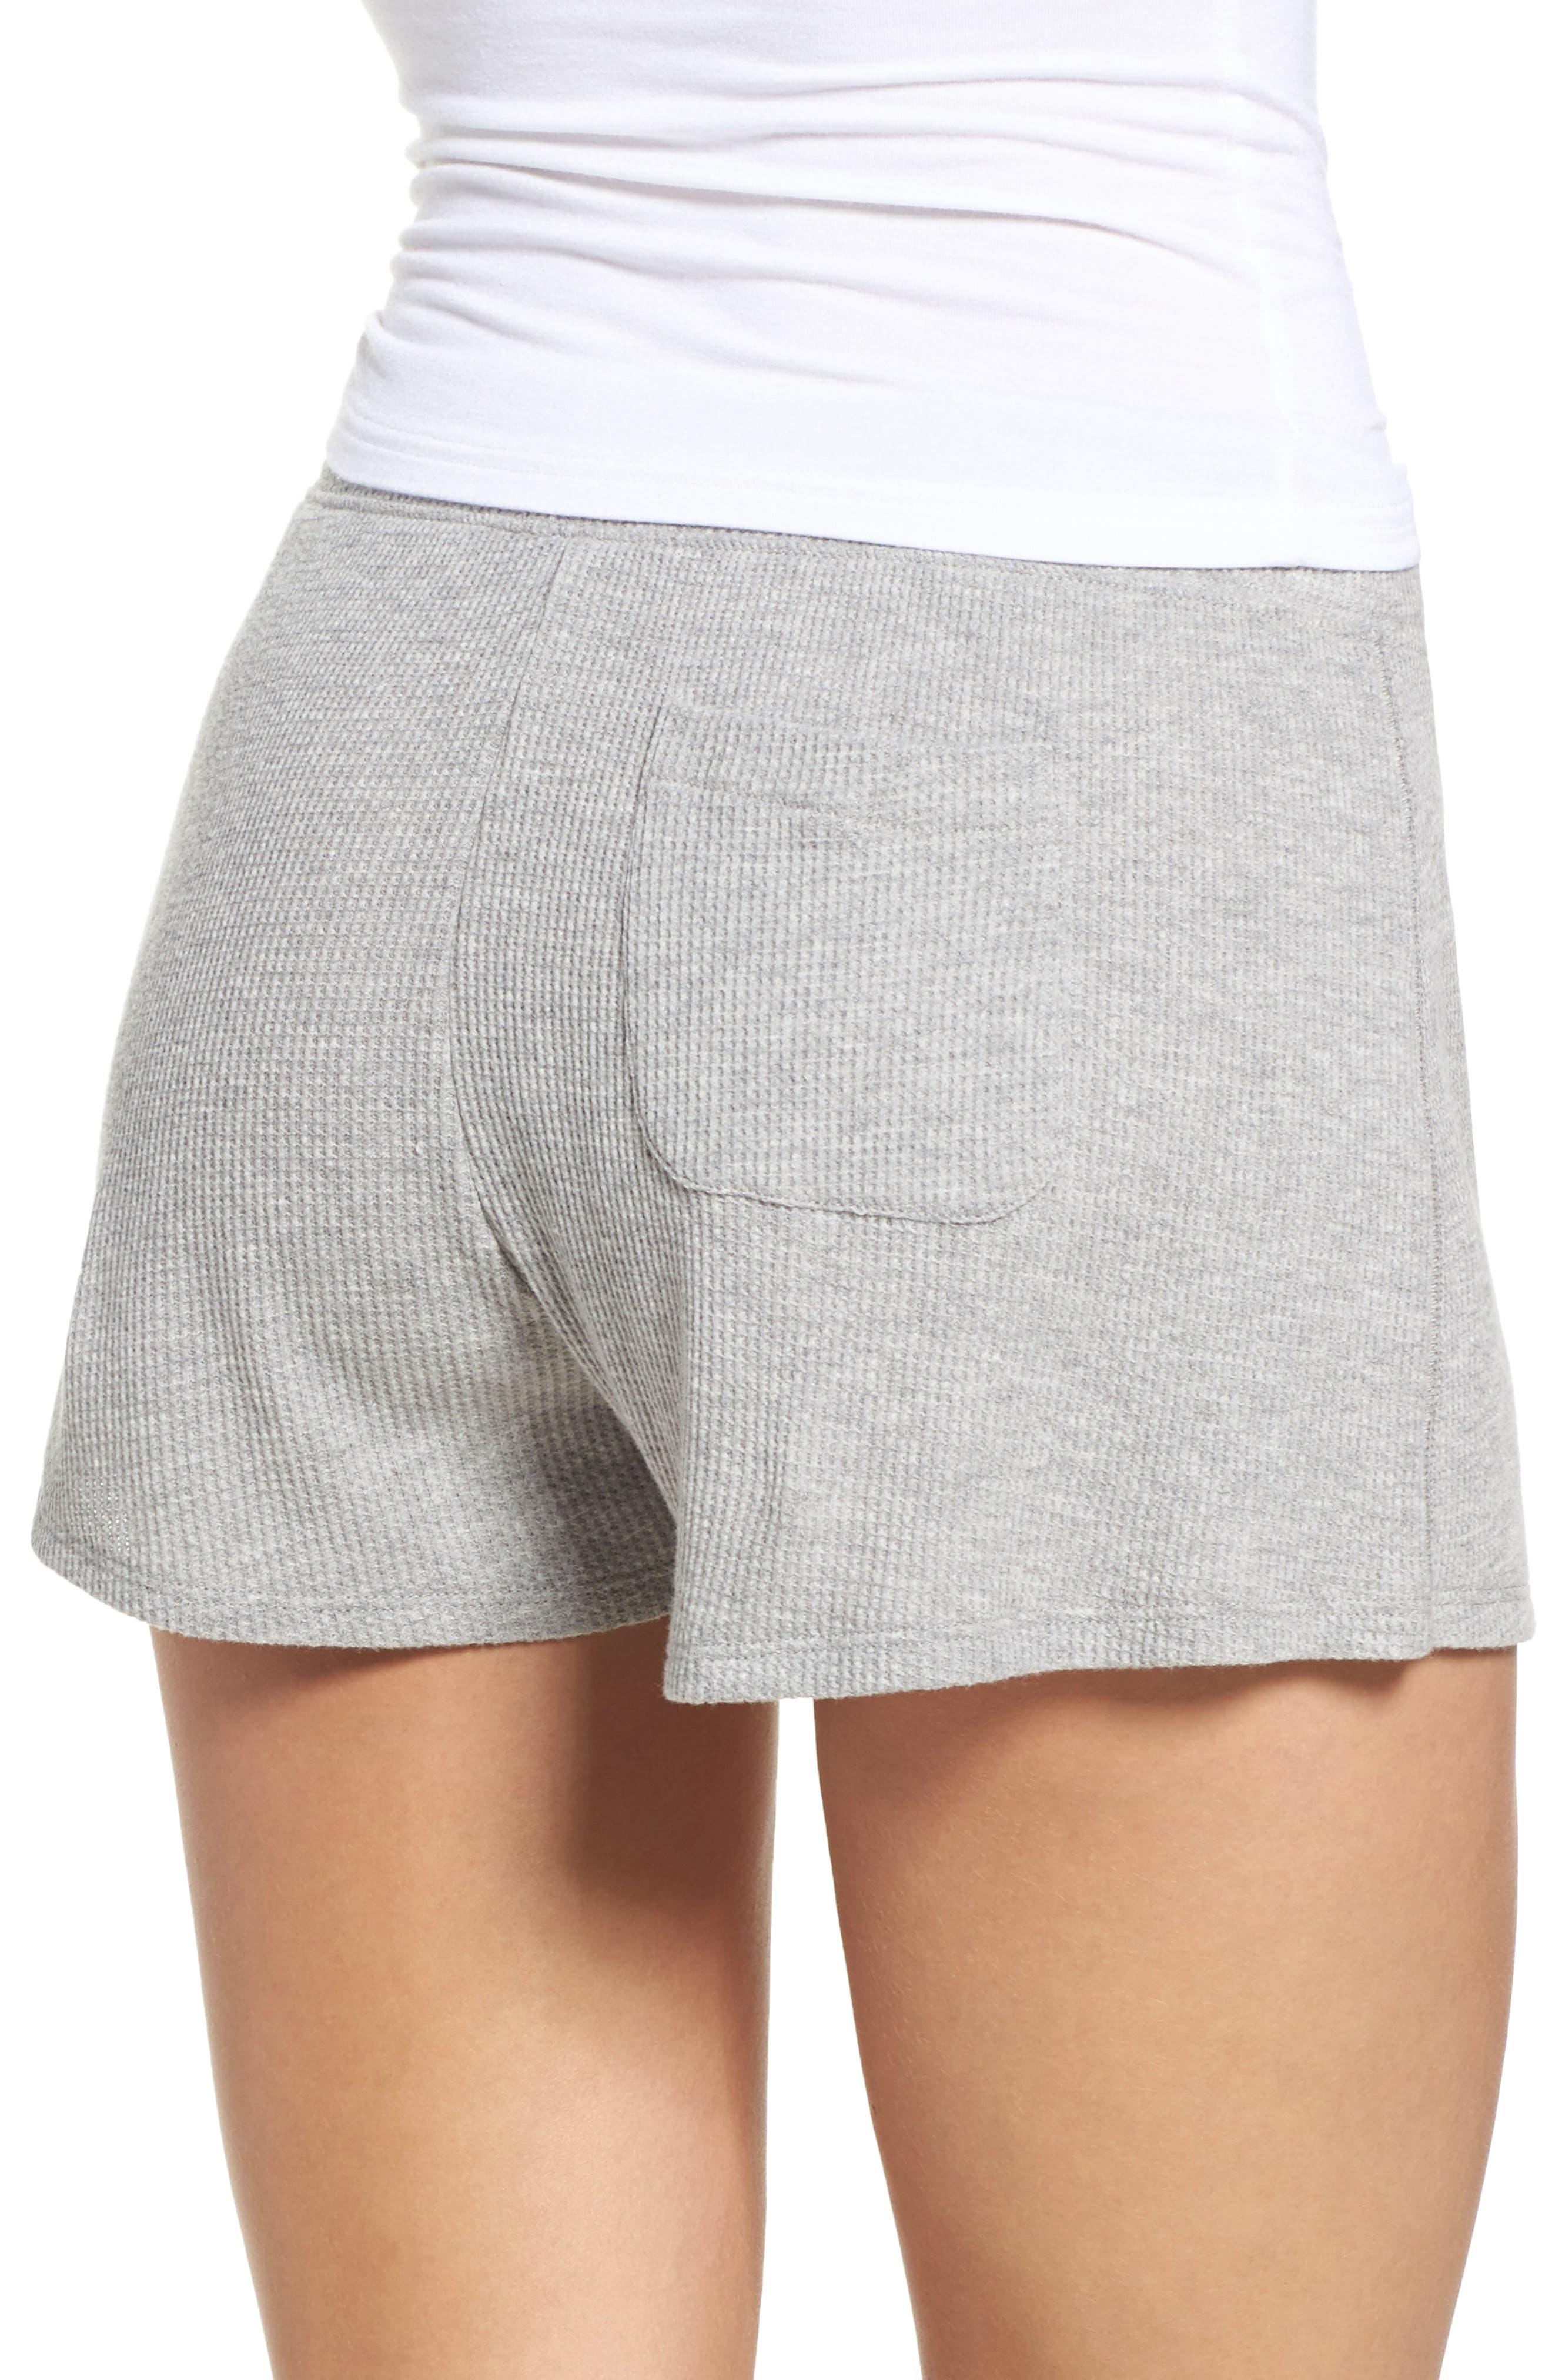 Waffle Knit Lounge Shorts,                             Alternate thumbnail 2, color,                             Heather Grey